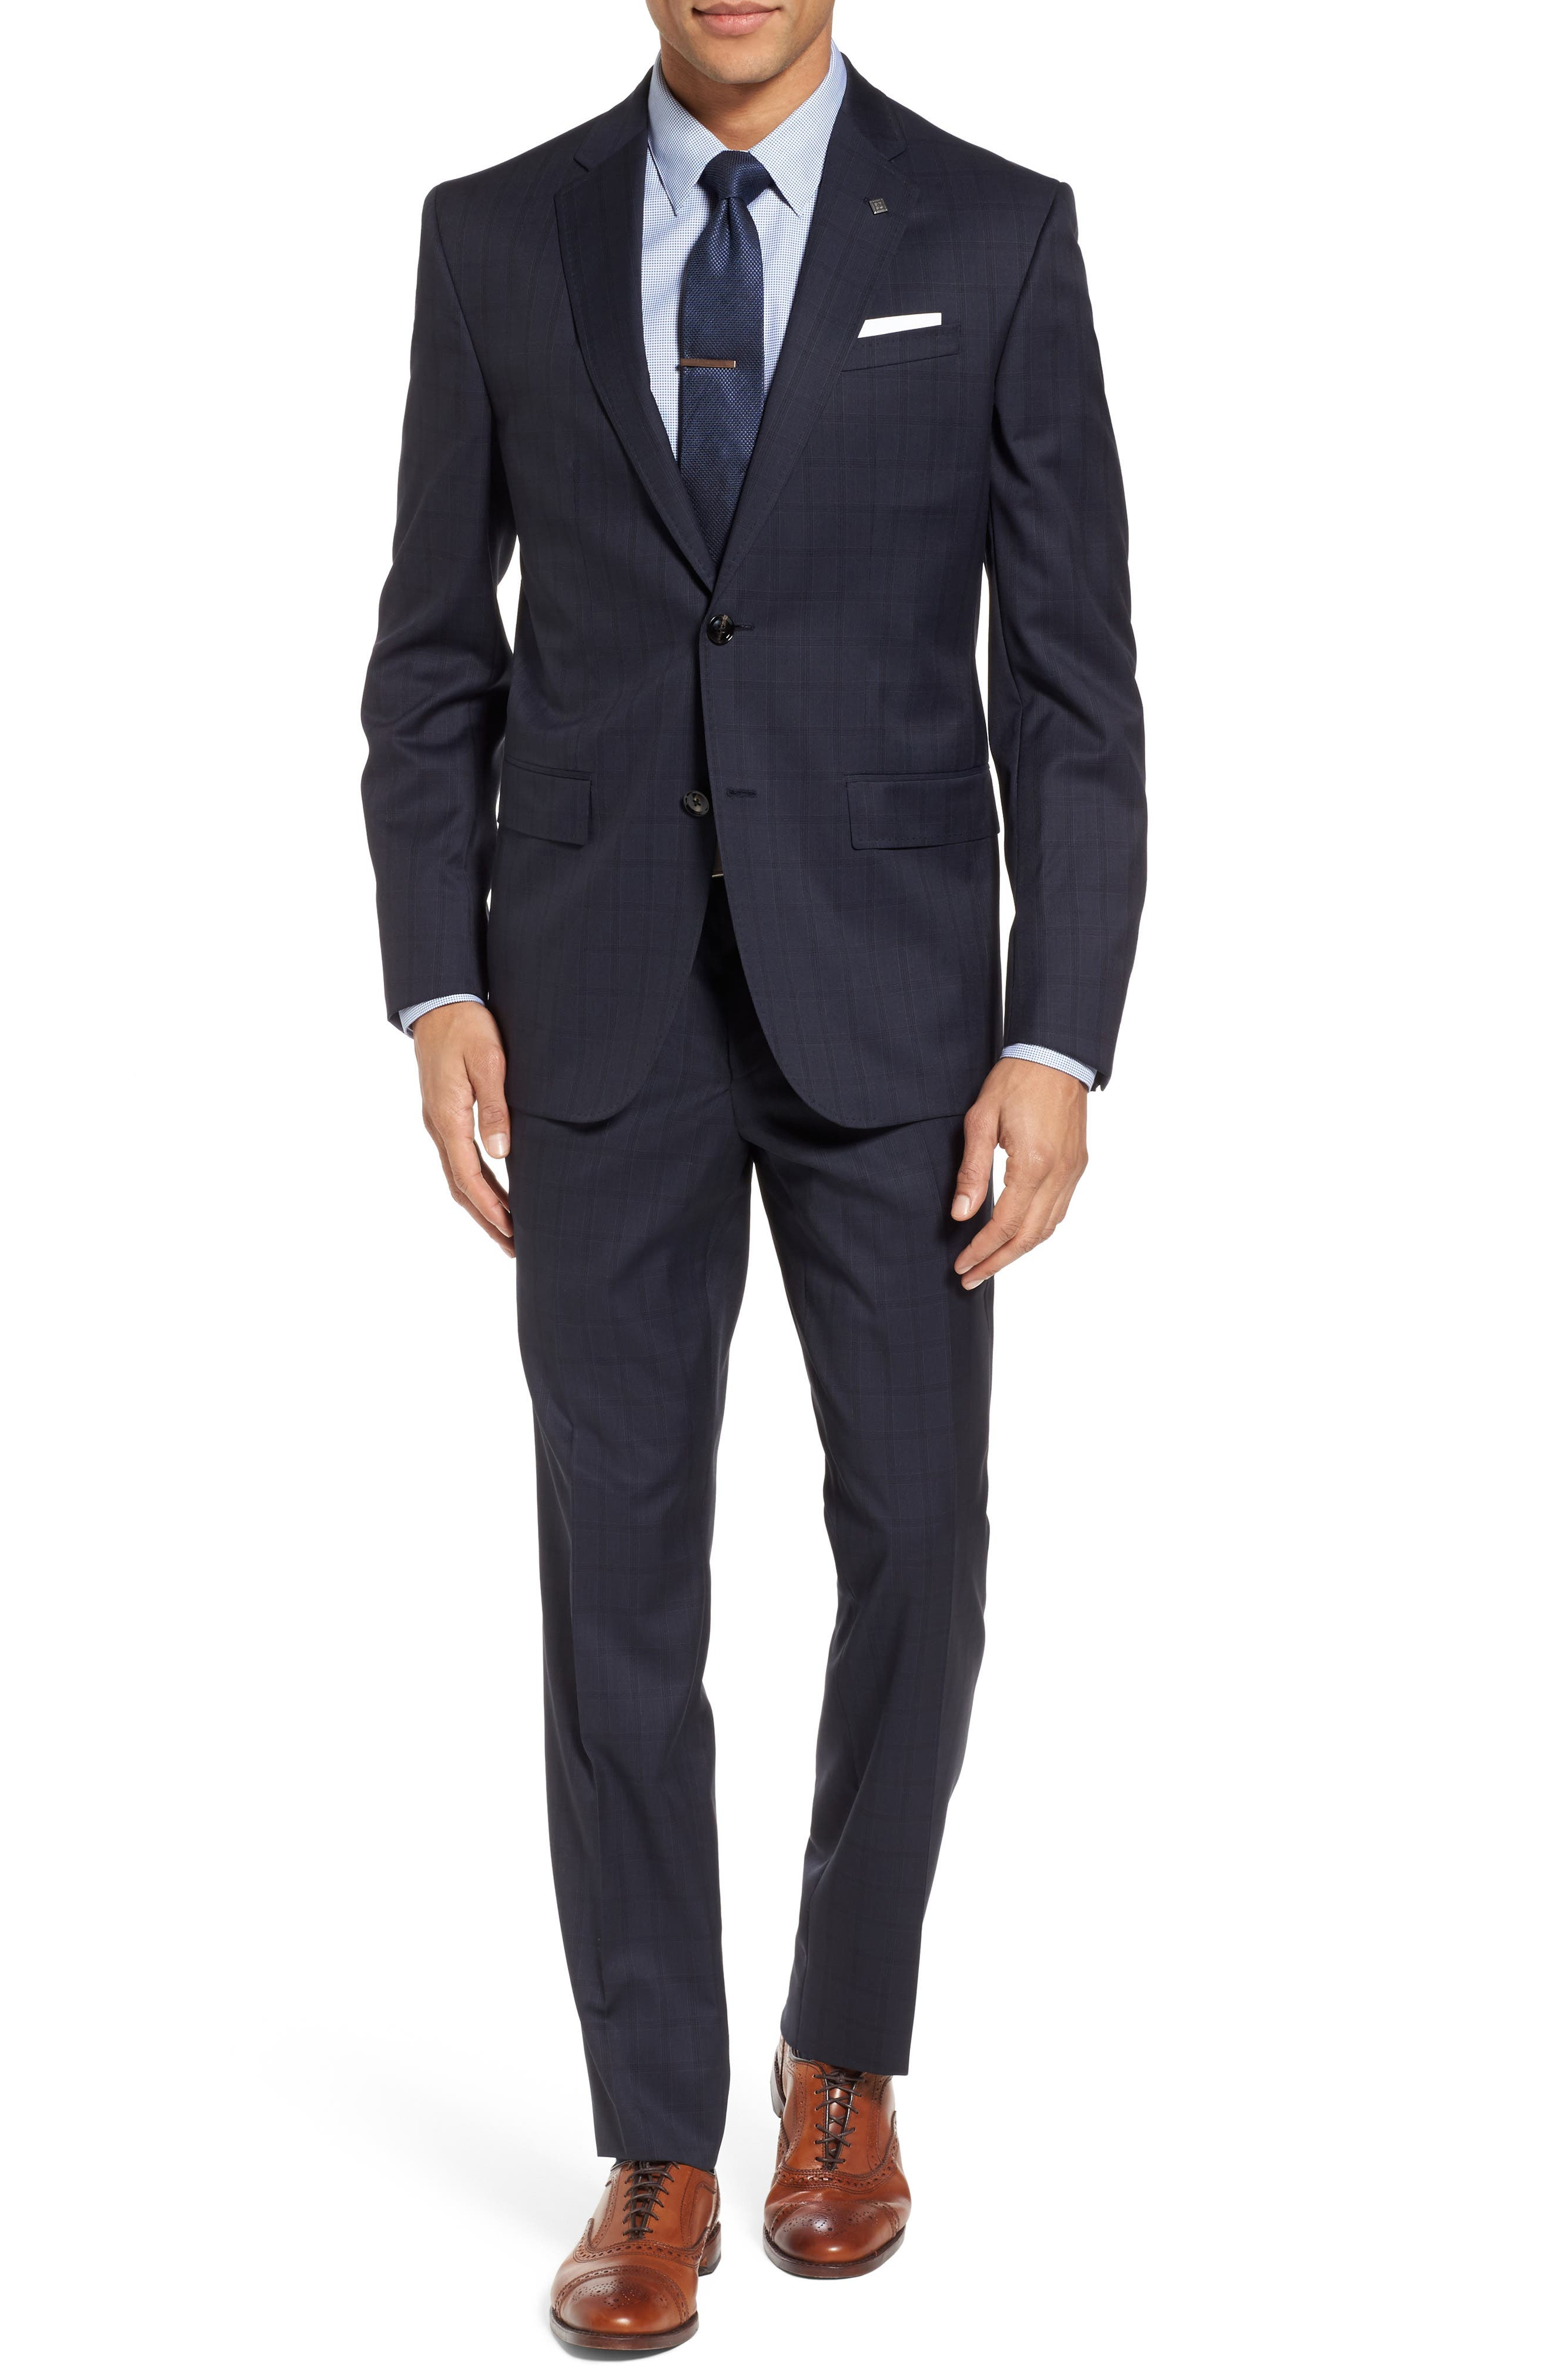 Jay Trim Fit Check Wool Suit,                             Main thumbnail 1, color,                             410